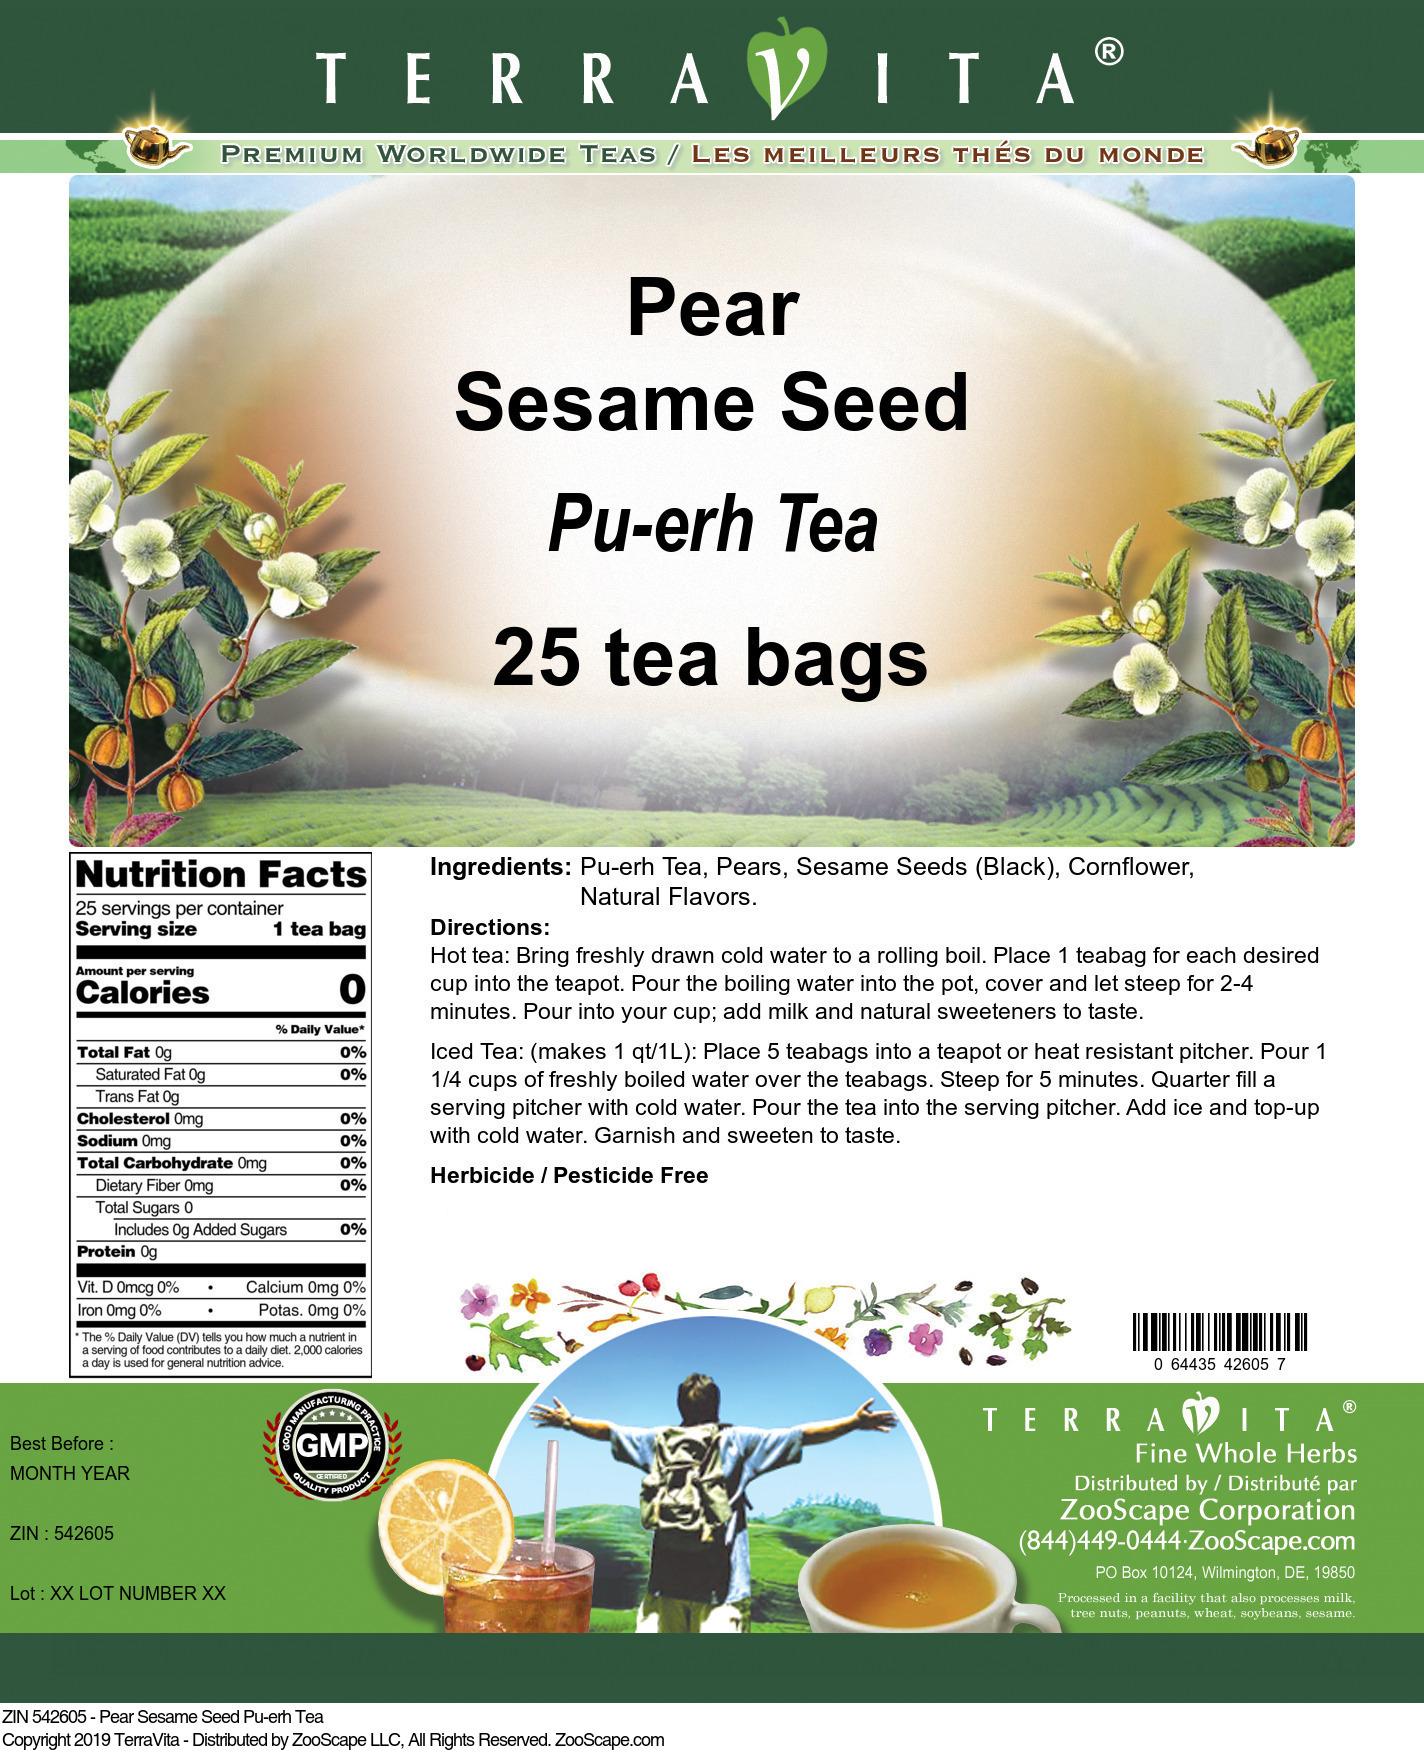 Pear Sesame Seed Pu-erh Tea